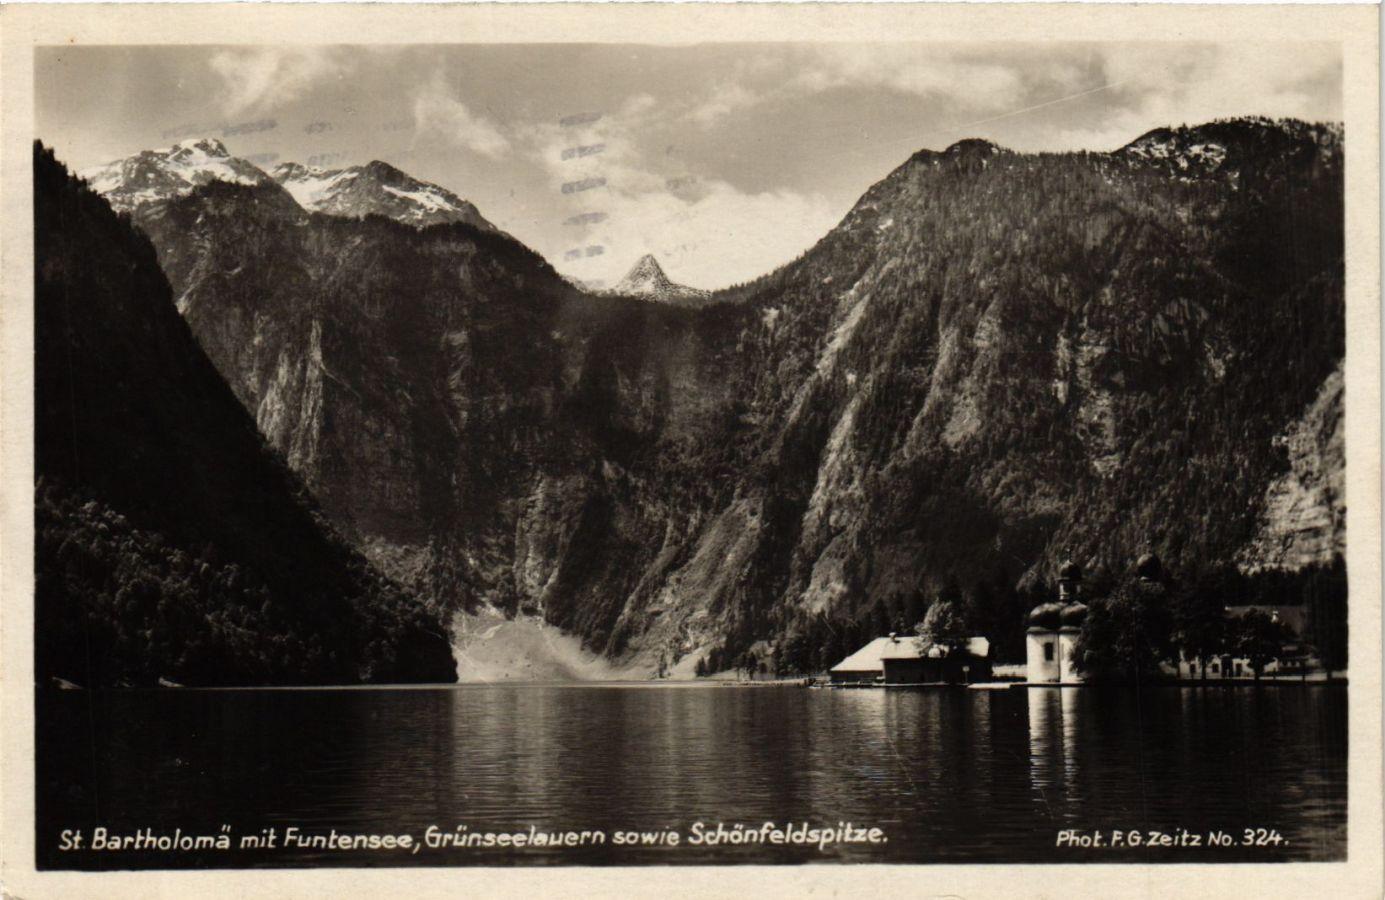 CPA-AK-St-Bartholoma-mit-Funtensee-GERMANY-878897